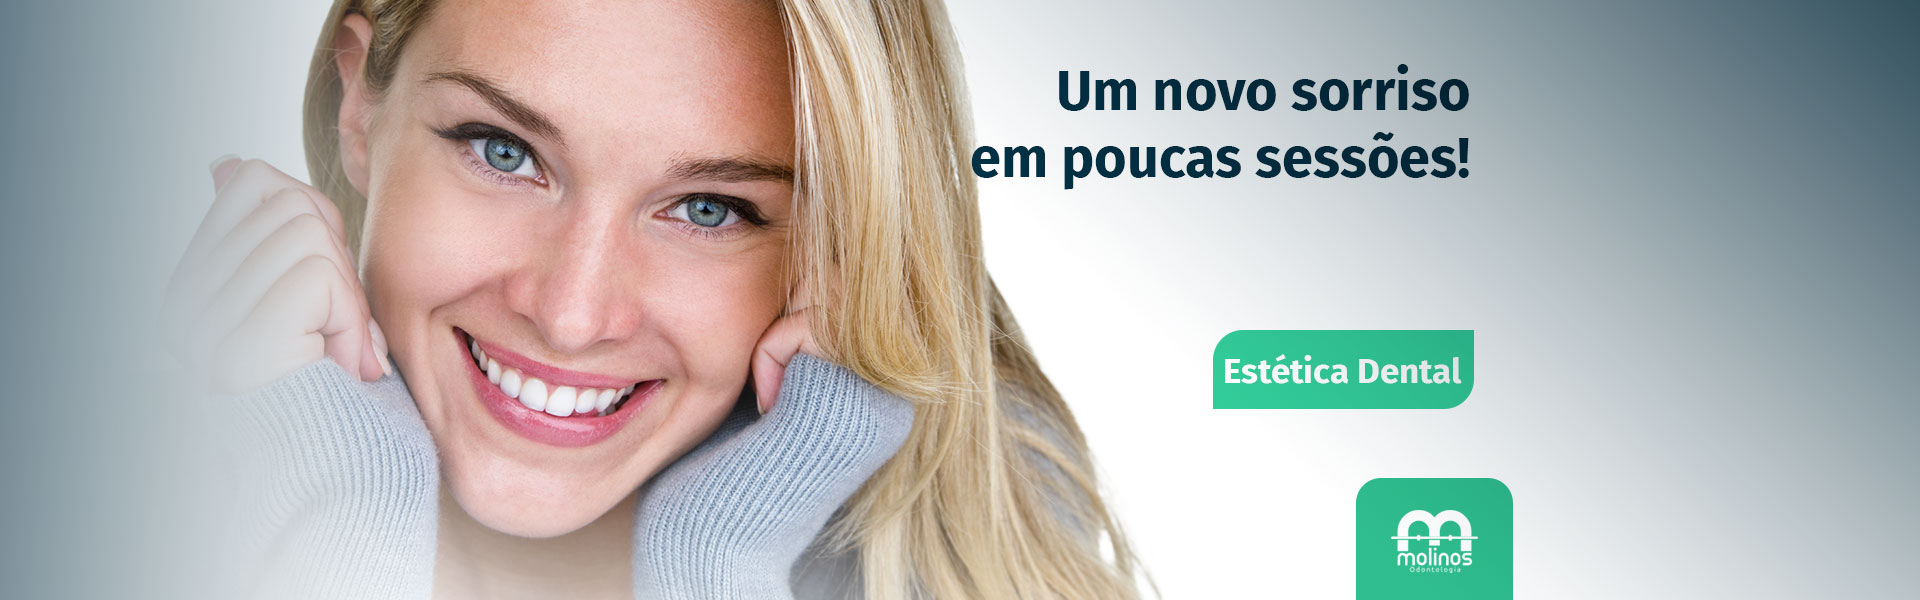 Início - Molinos Odontologia - image banner-4 on https://molinosodontologia.com.br